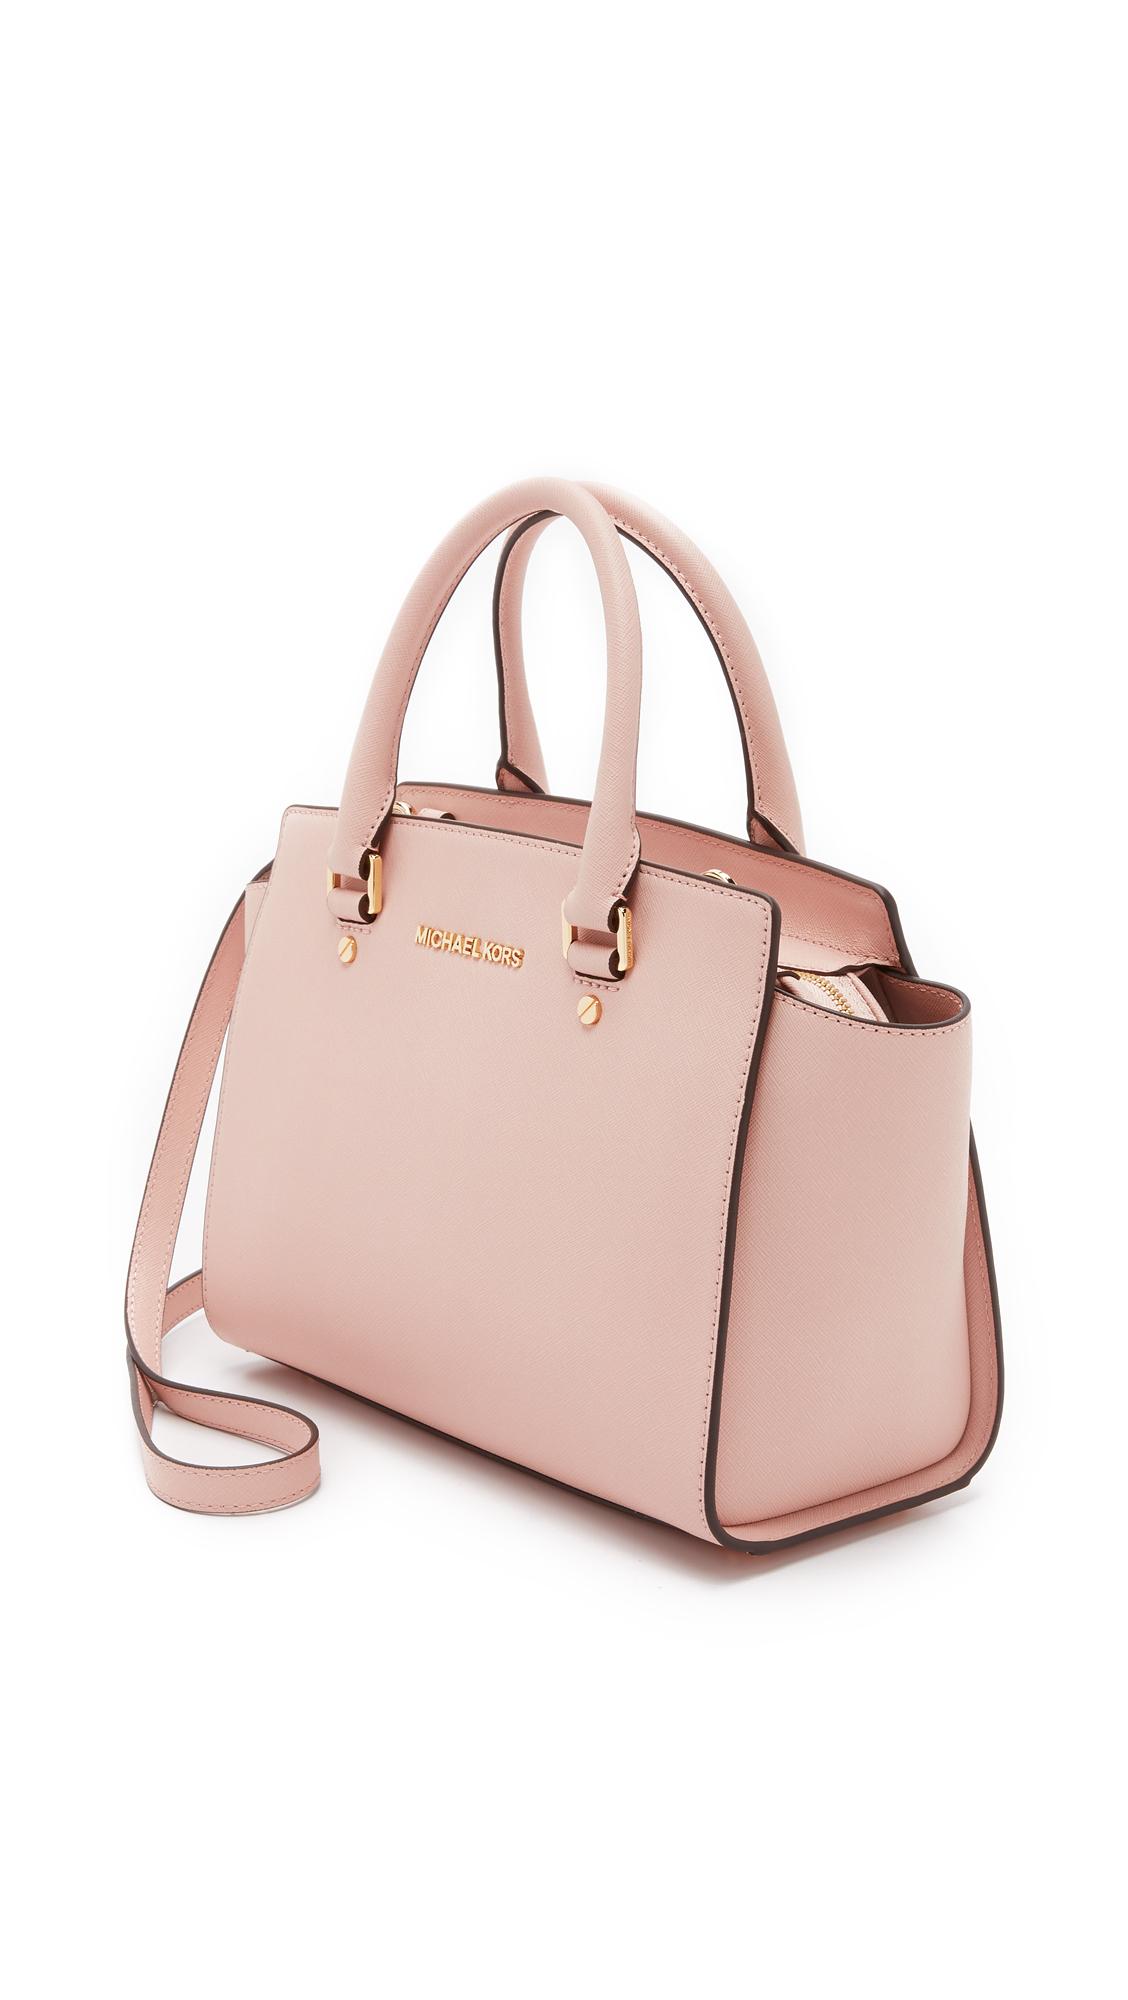 ... france lyst michael michael kors selma medium satchel ballet in pink  9079e e4ca7 46a68e807b027